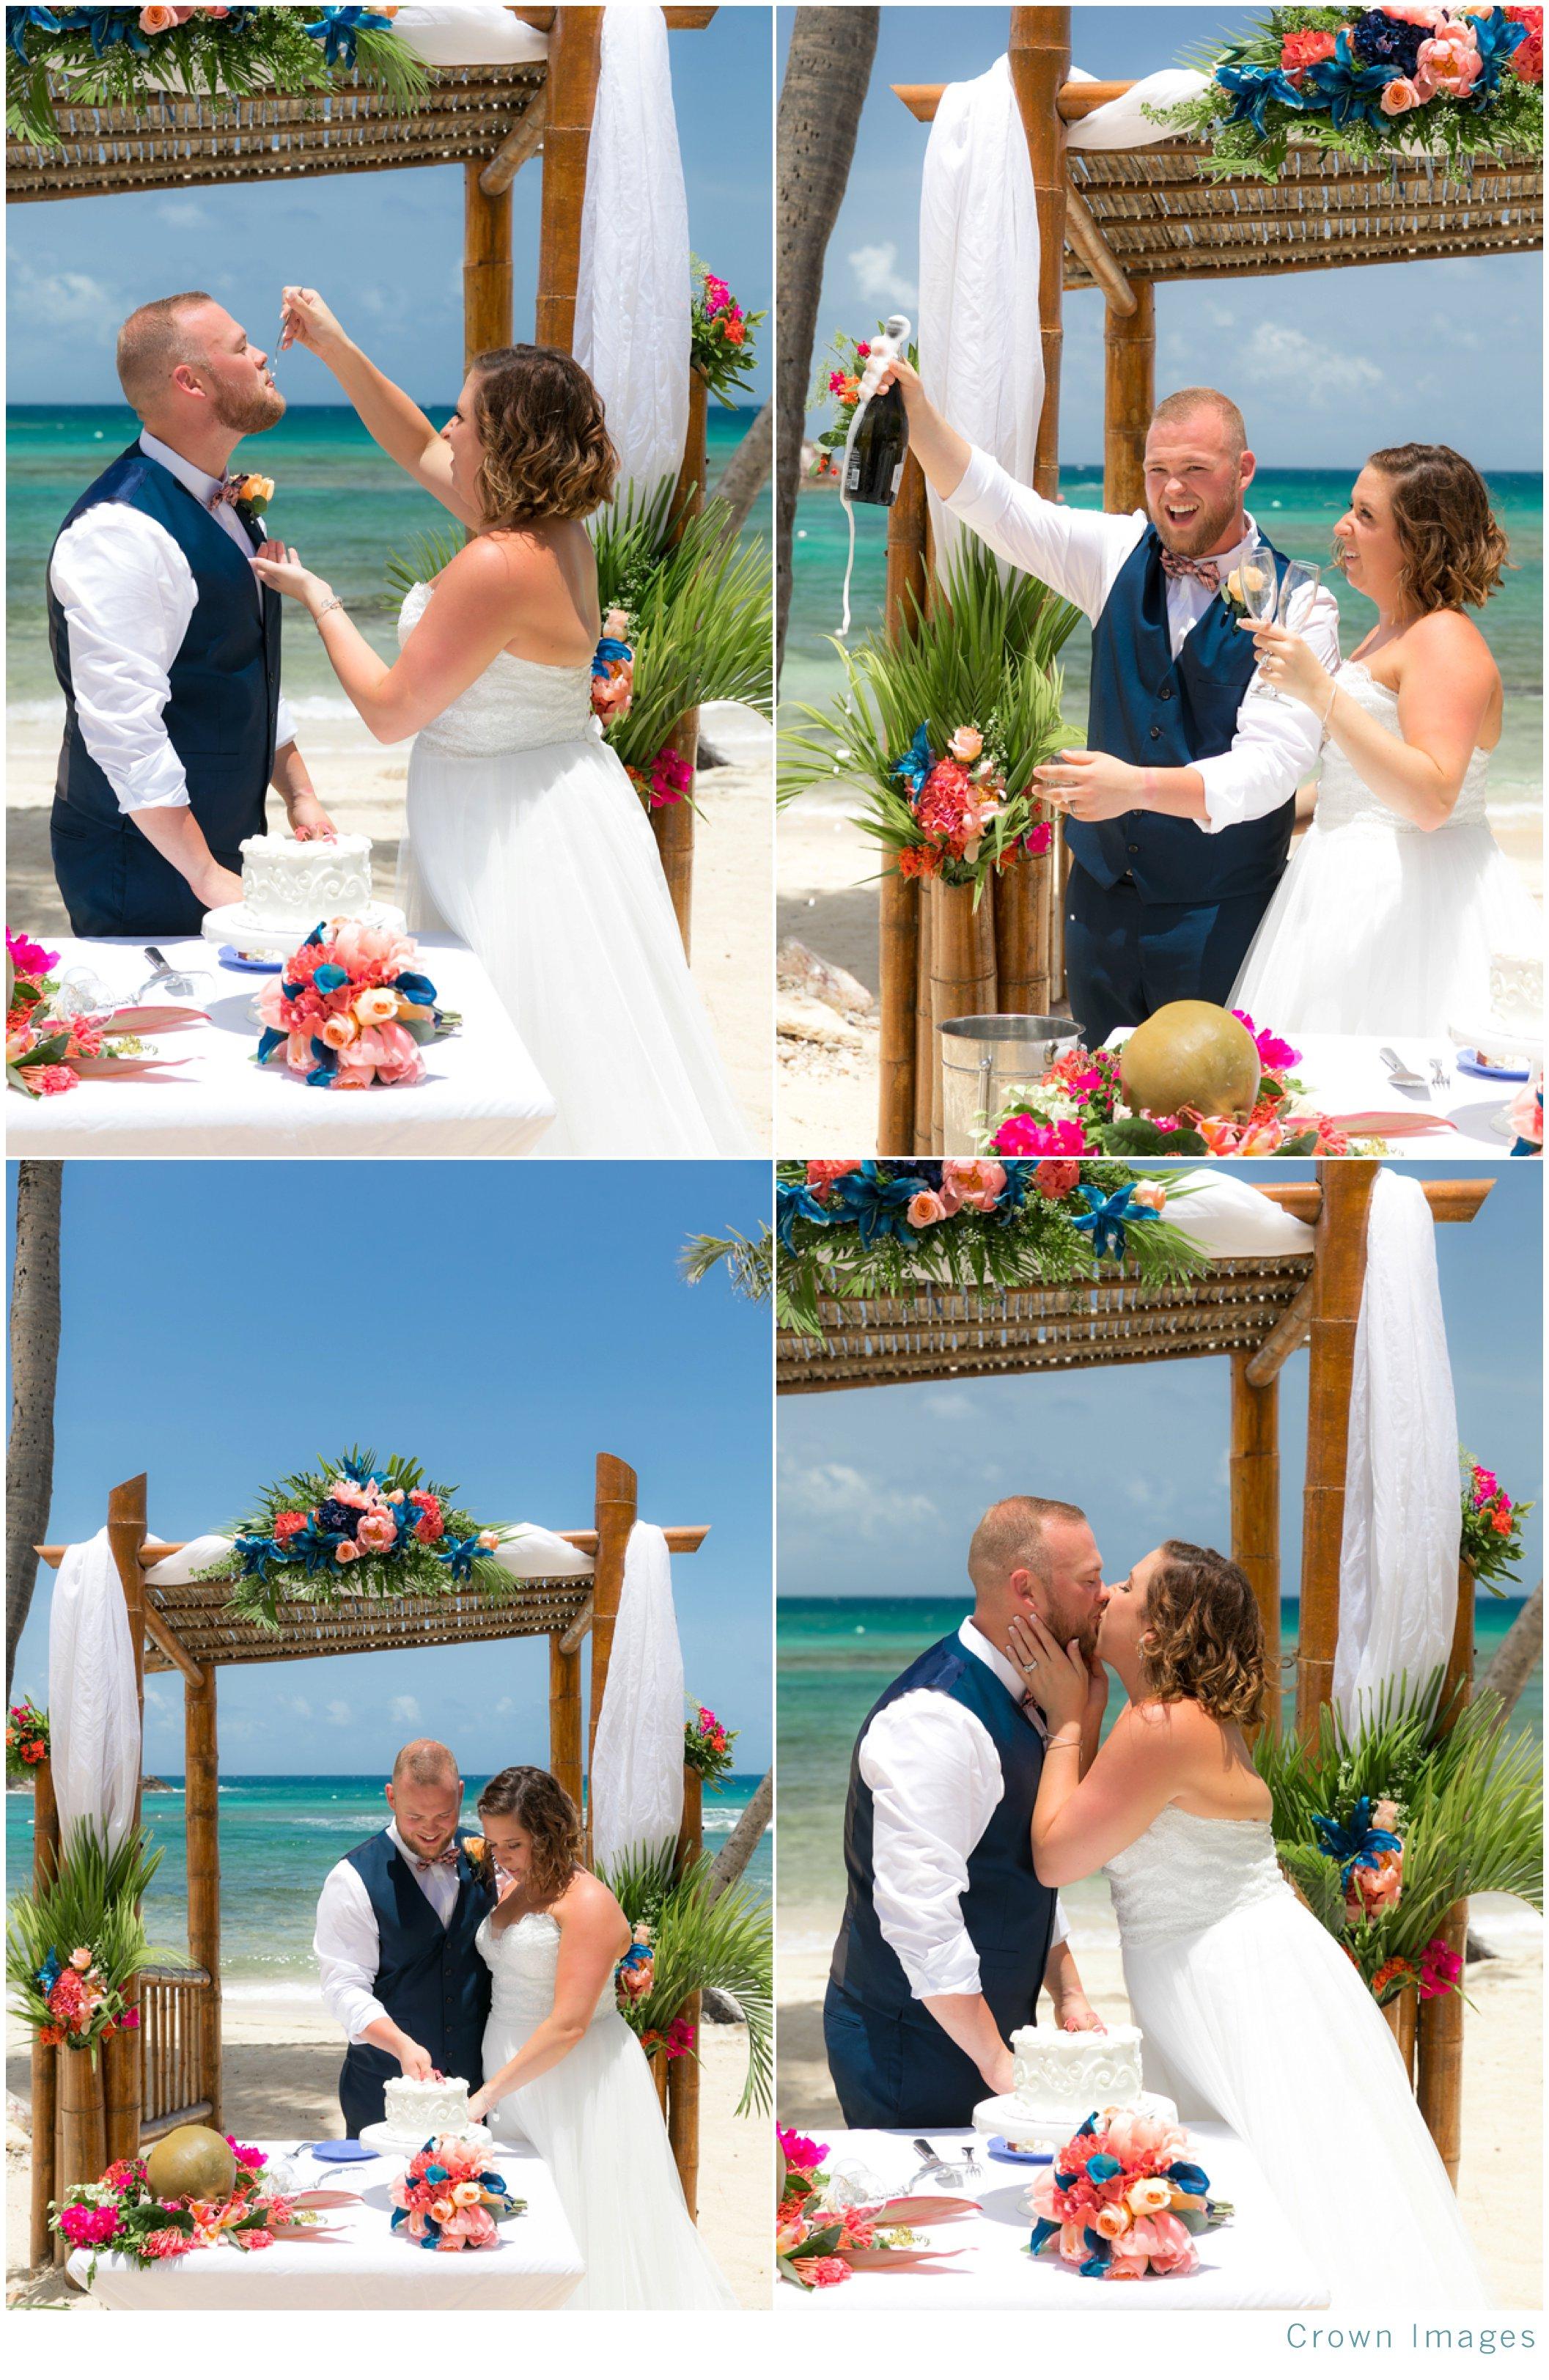 beach wedding cake cutting on st thomas